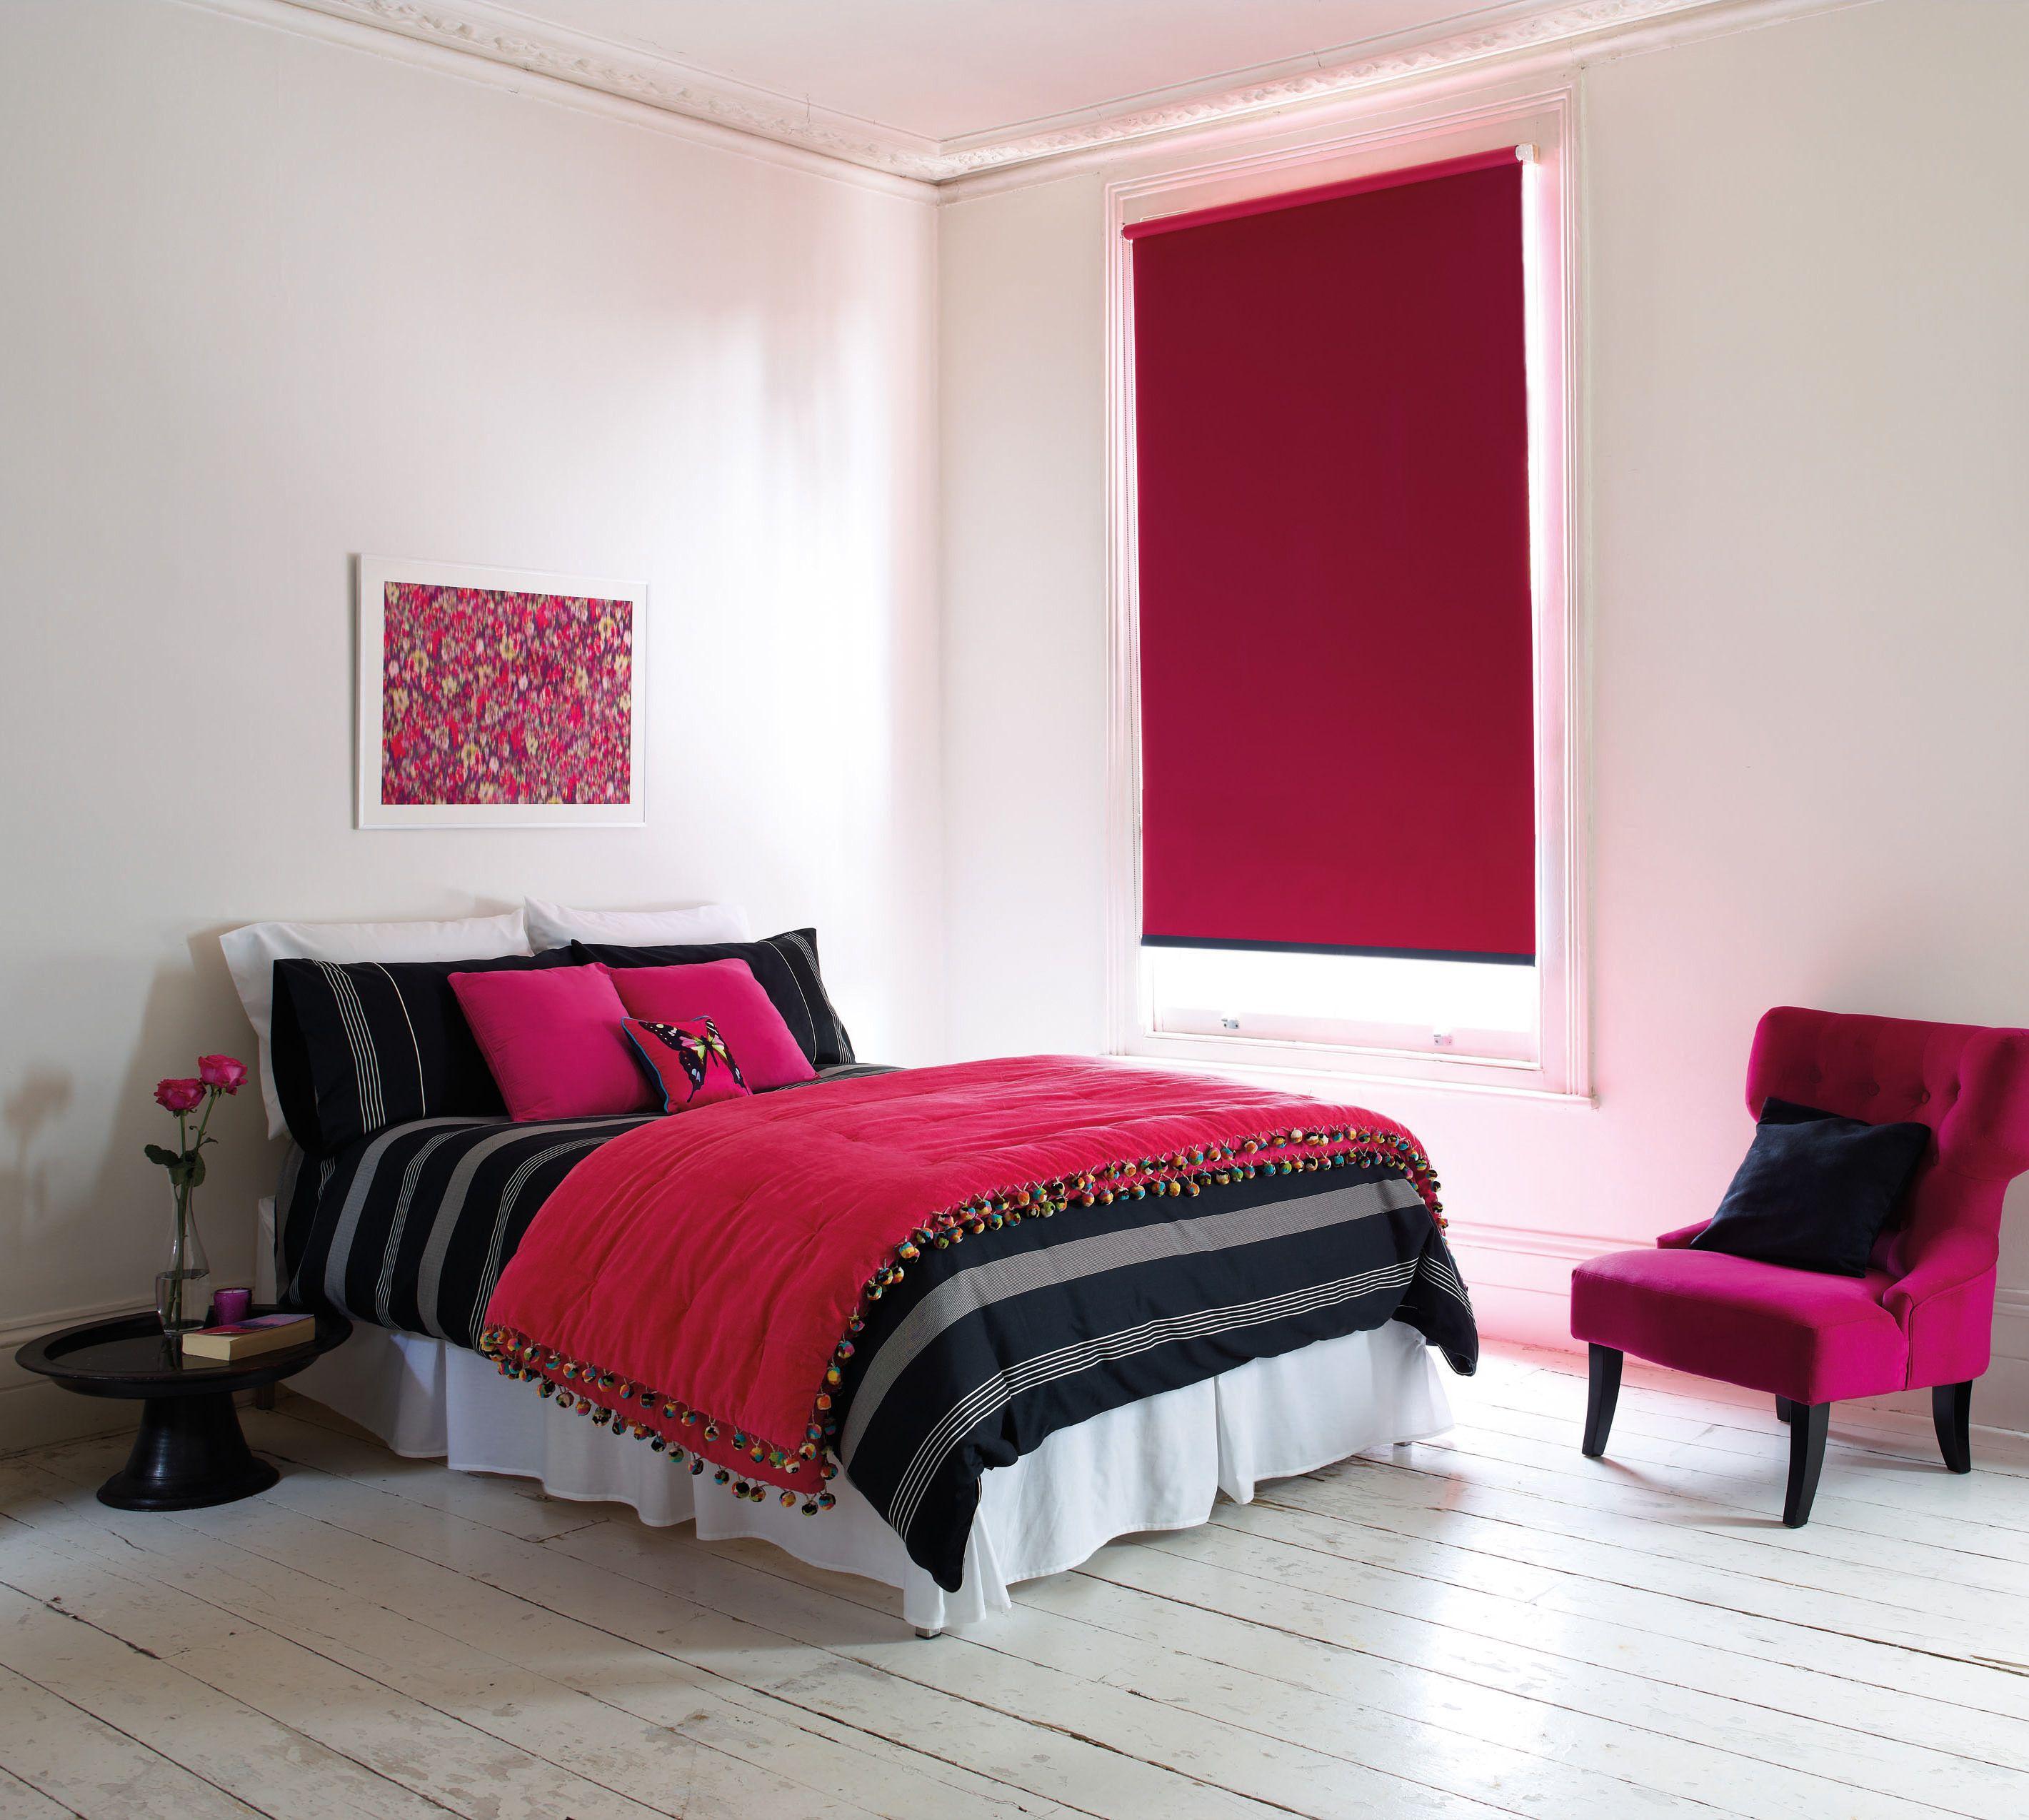 Bella Lollipop Roller Blind #thefabricbox #blackoutrollerblind #pinkrollerblind #windowfashion #bedroom #blind #pink #strikingdesign #interiors